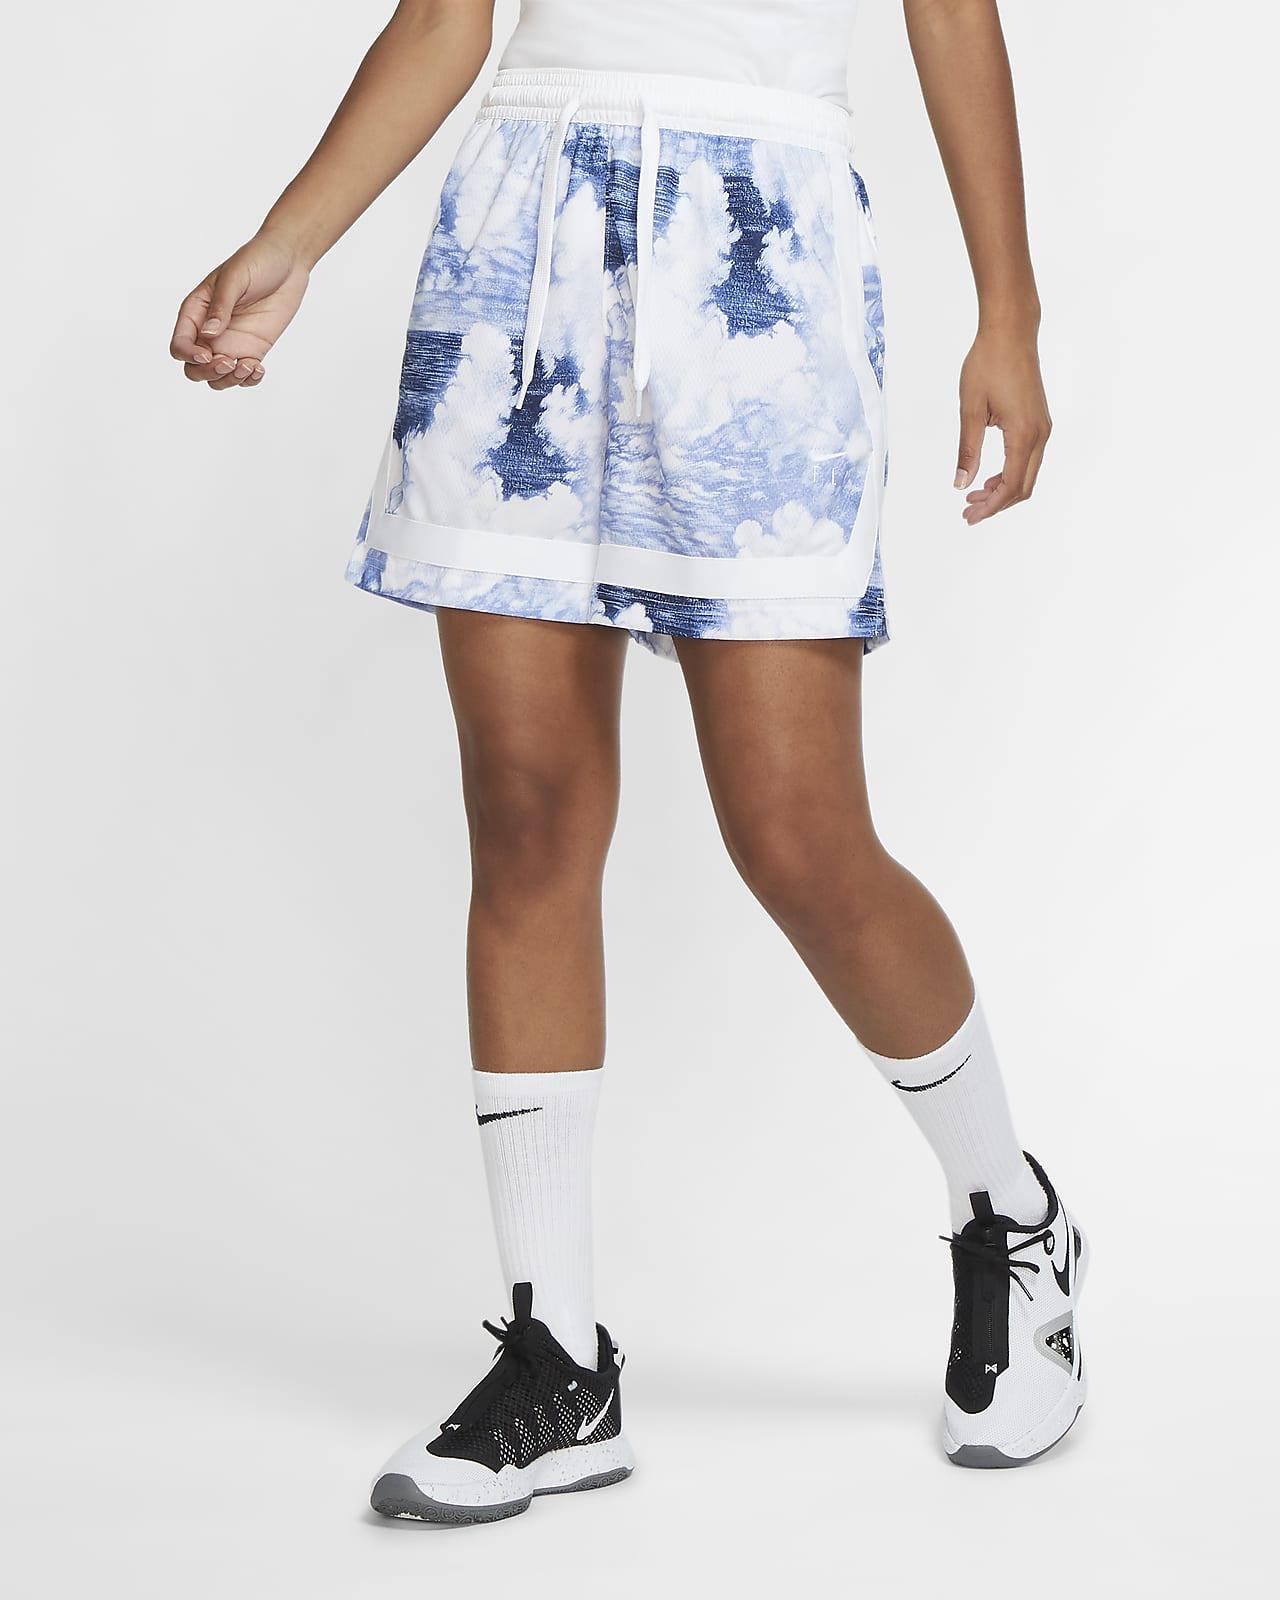 Nike Swoosh Fly Women's Basketball Printed Shorts